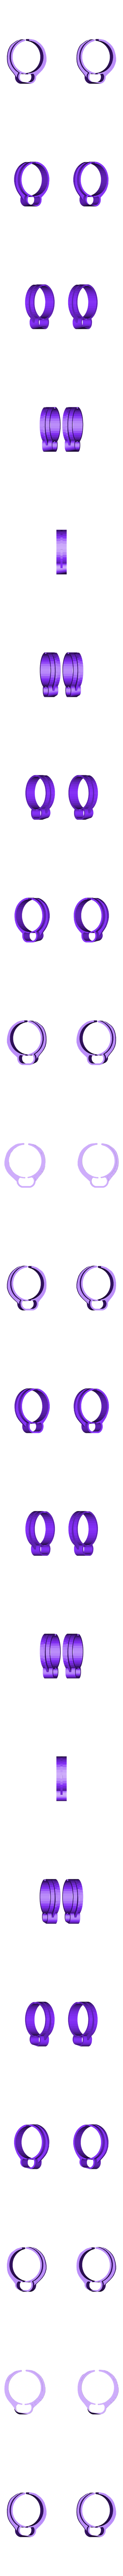 clip T3PA thrusmaster ferrari integrale.stl Download free STL file fixation for T3PA Thrusmaster ferrari integrale • 3D printer model, Stephane62